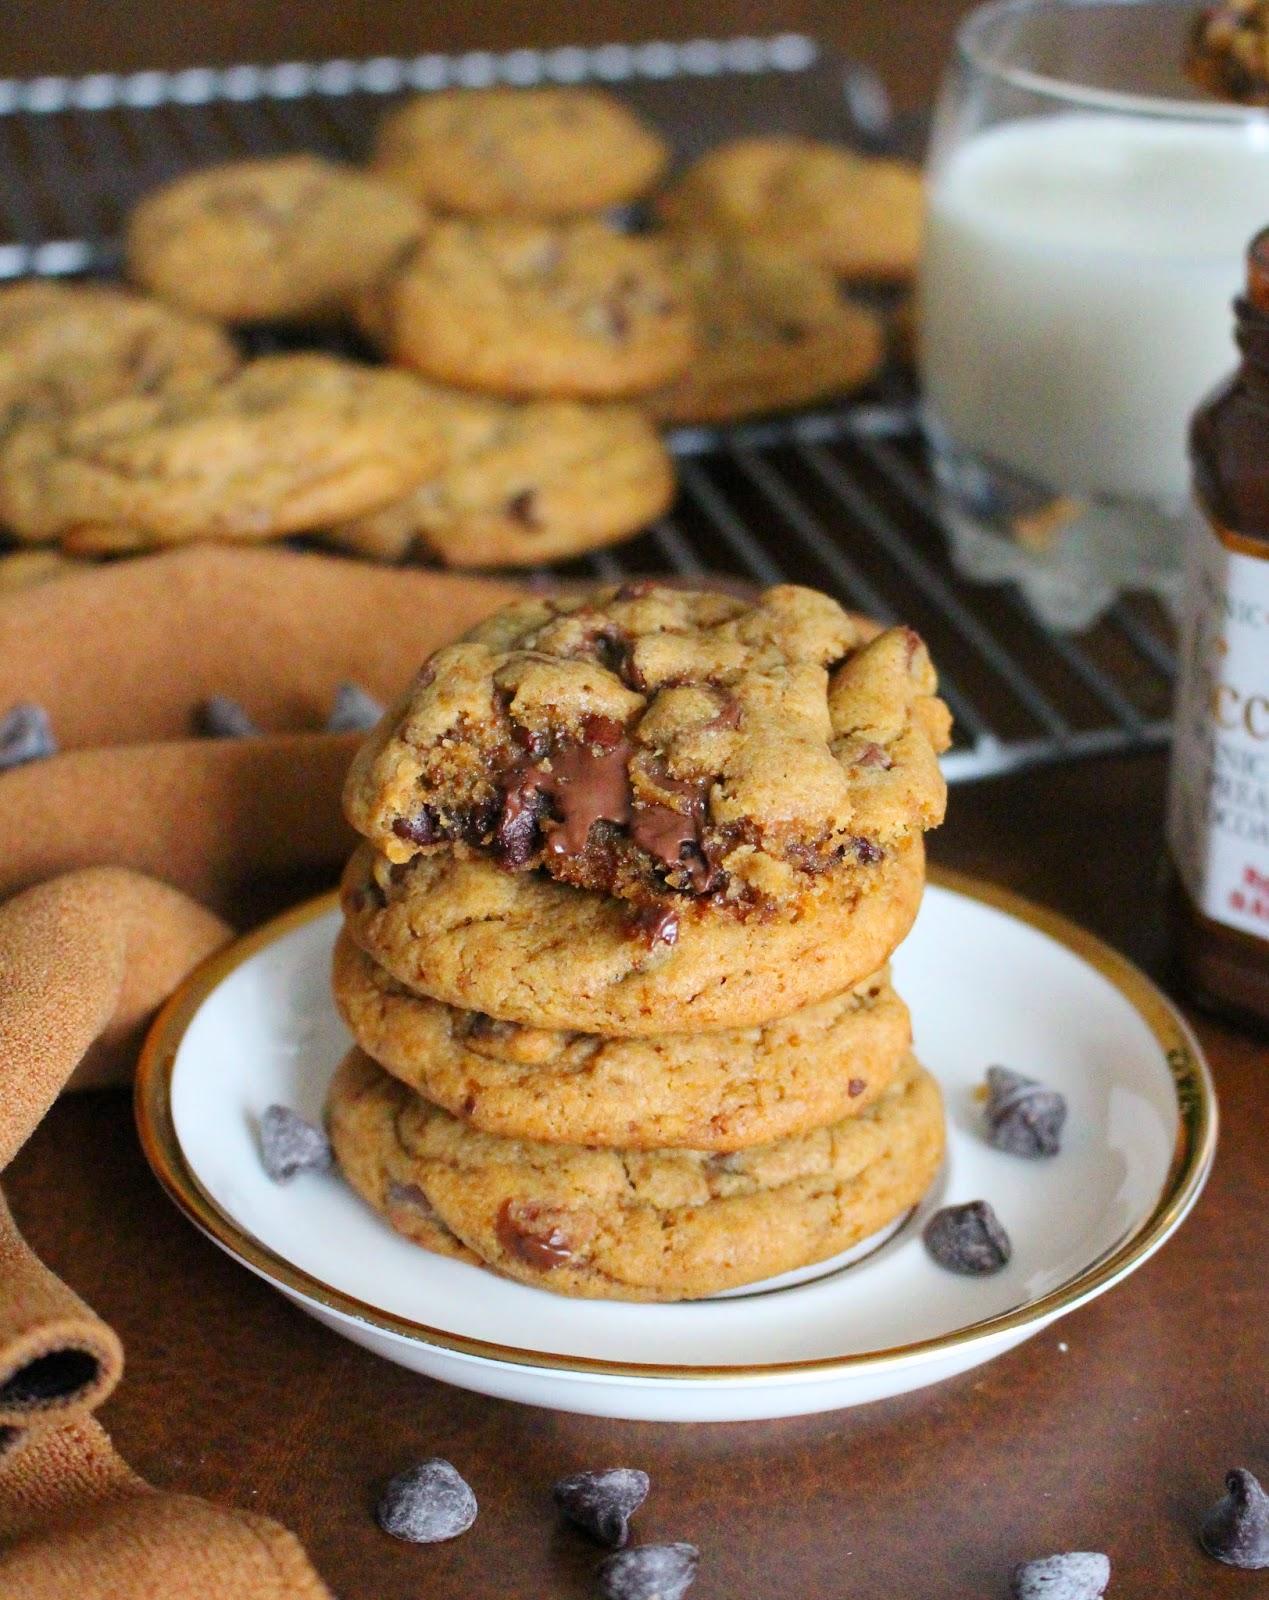 Stuffed+Chocolate+Chip+Cookies+040.e.JPG